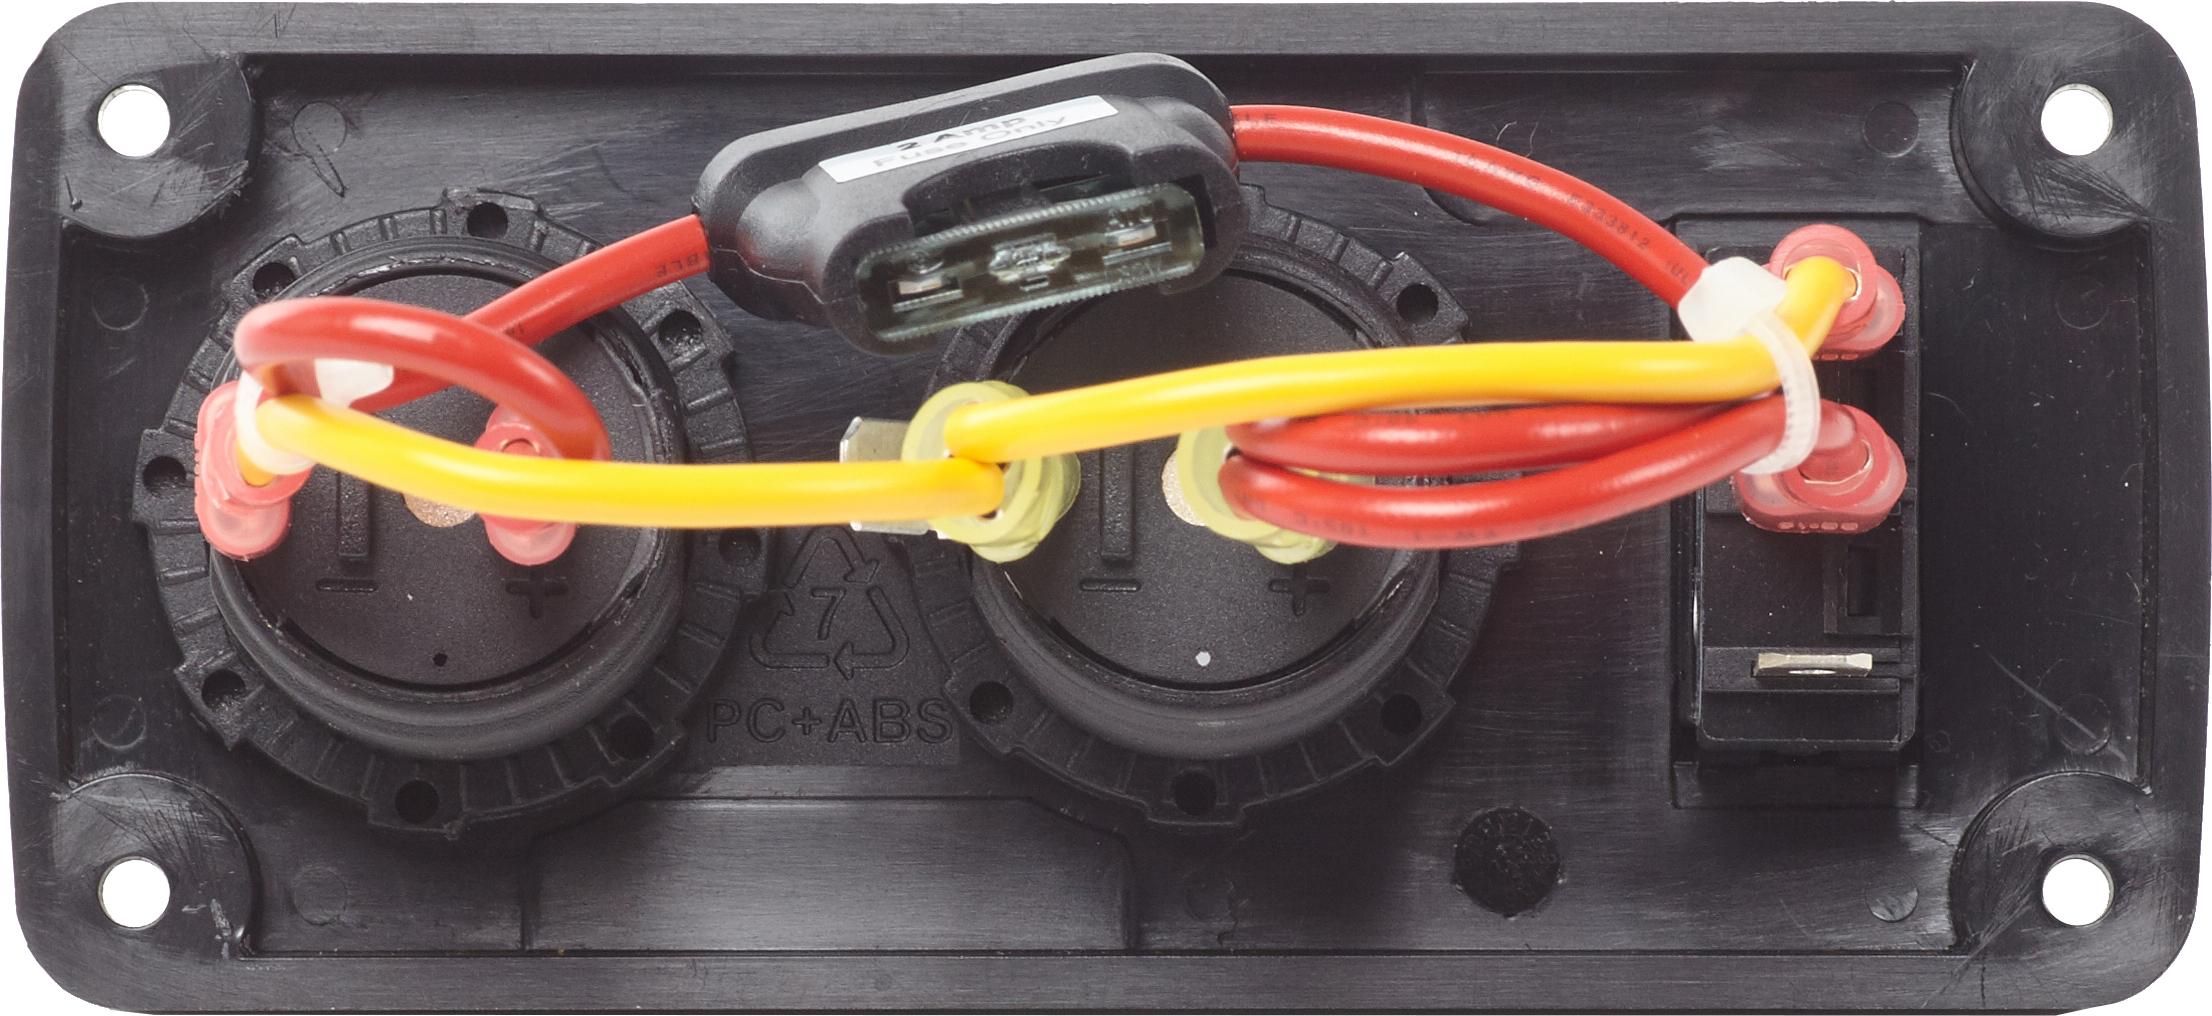 Belowdeck Panel 15a Circuit Breaker 12v Socket 21a Dual Usb Wiring Products Dc